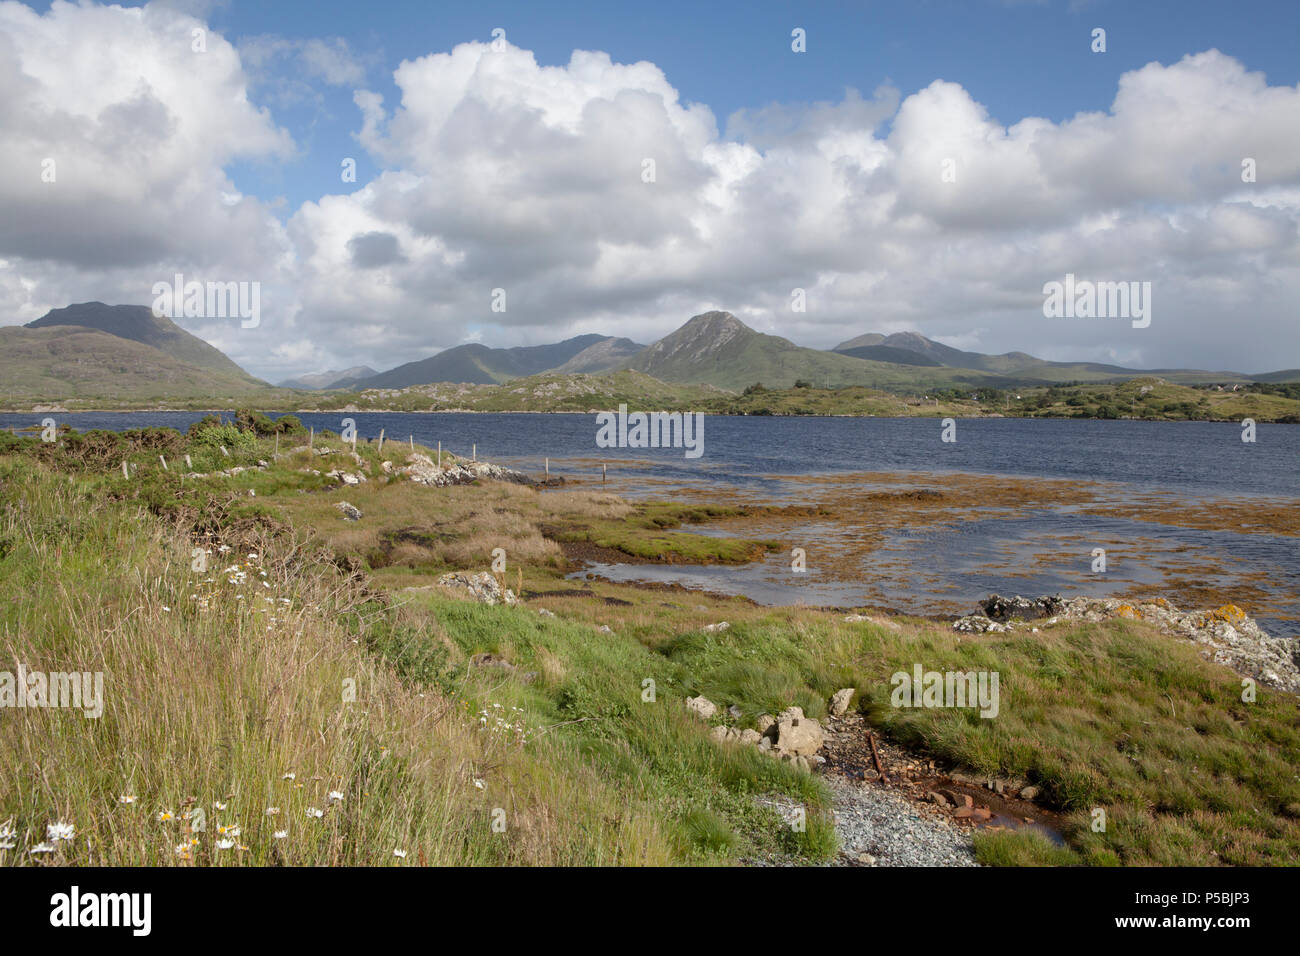 Looking towards the Twelve Bens (or Twelve Pins) Mountains from the Connemara Loop Road on the Renvyle Peninsula - Stock Image